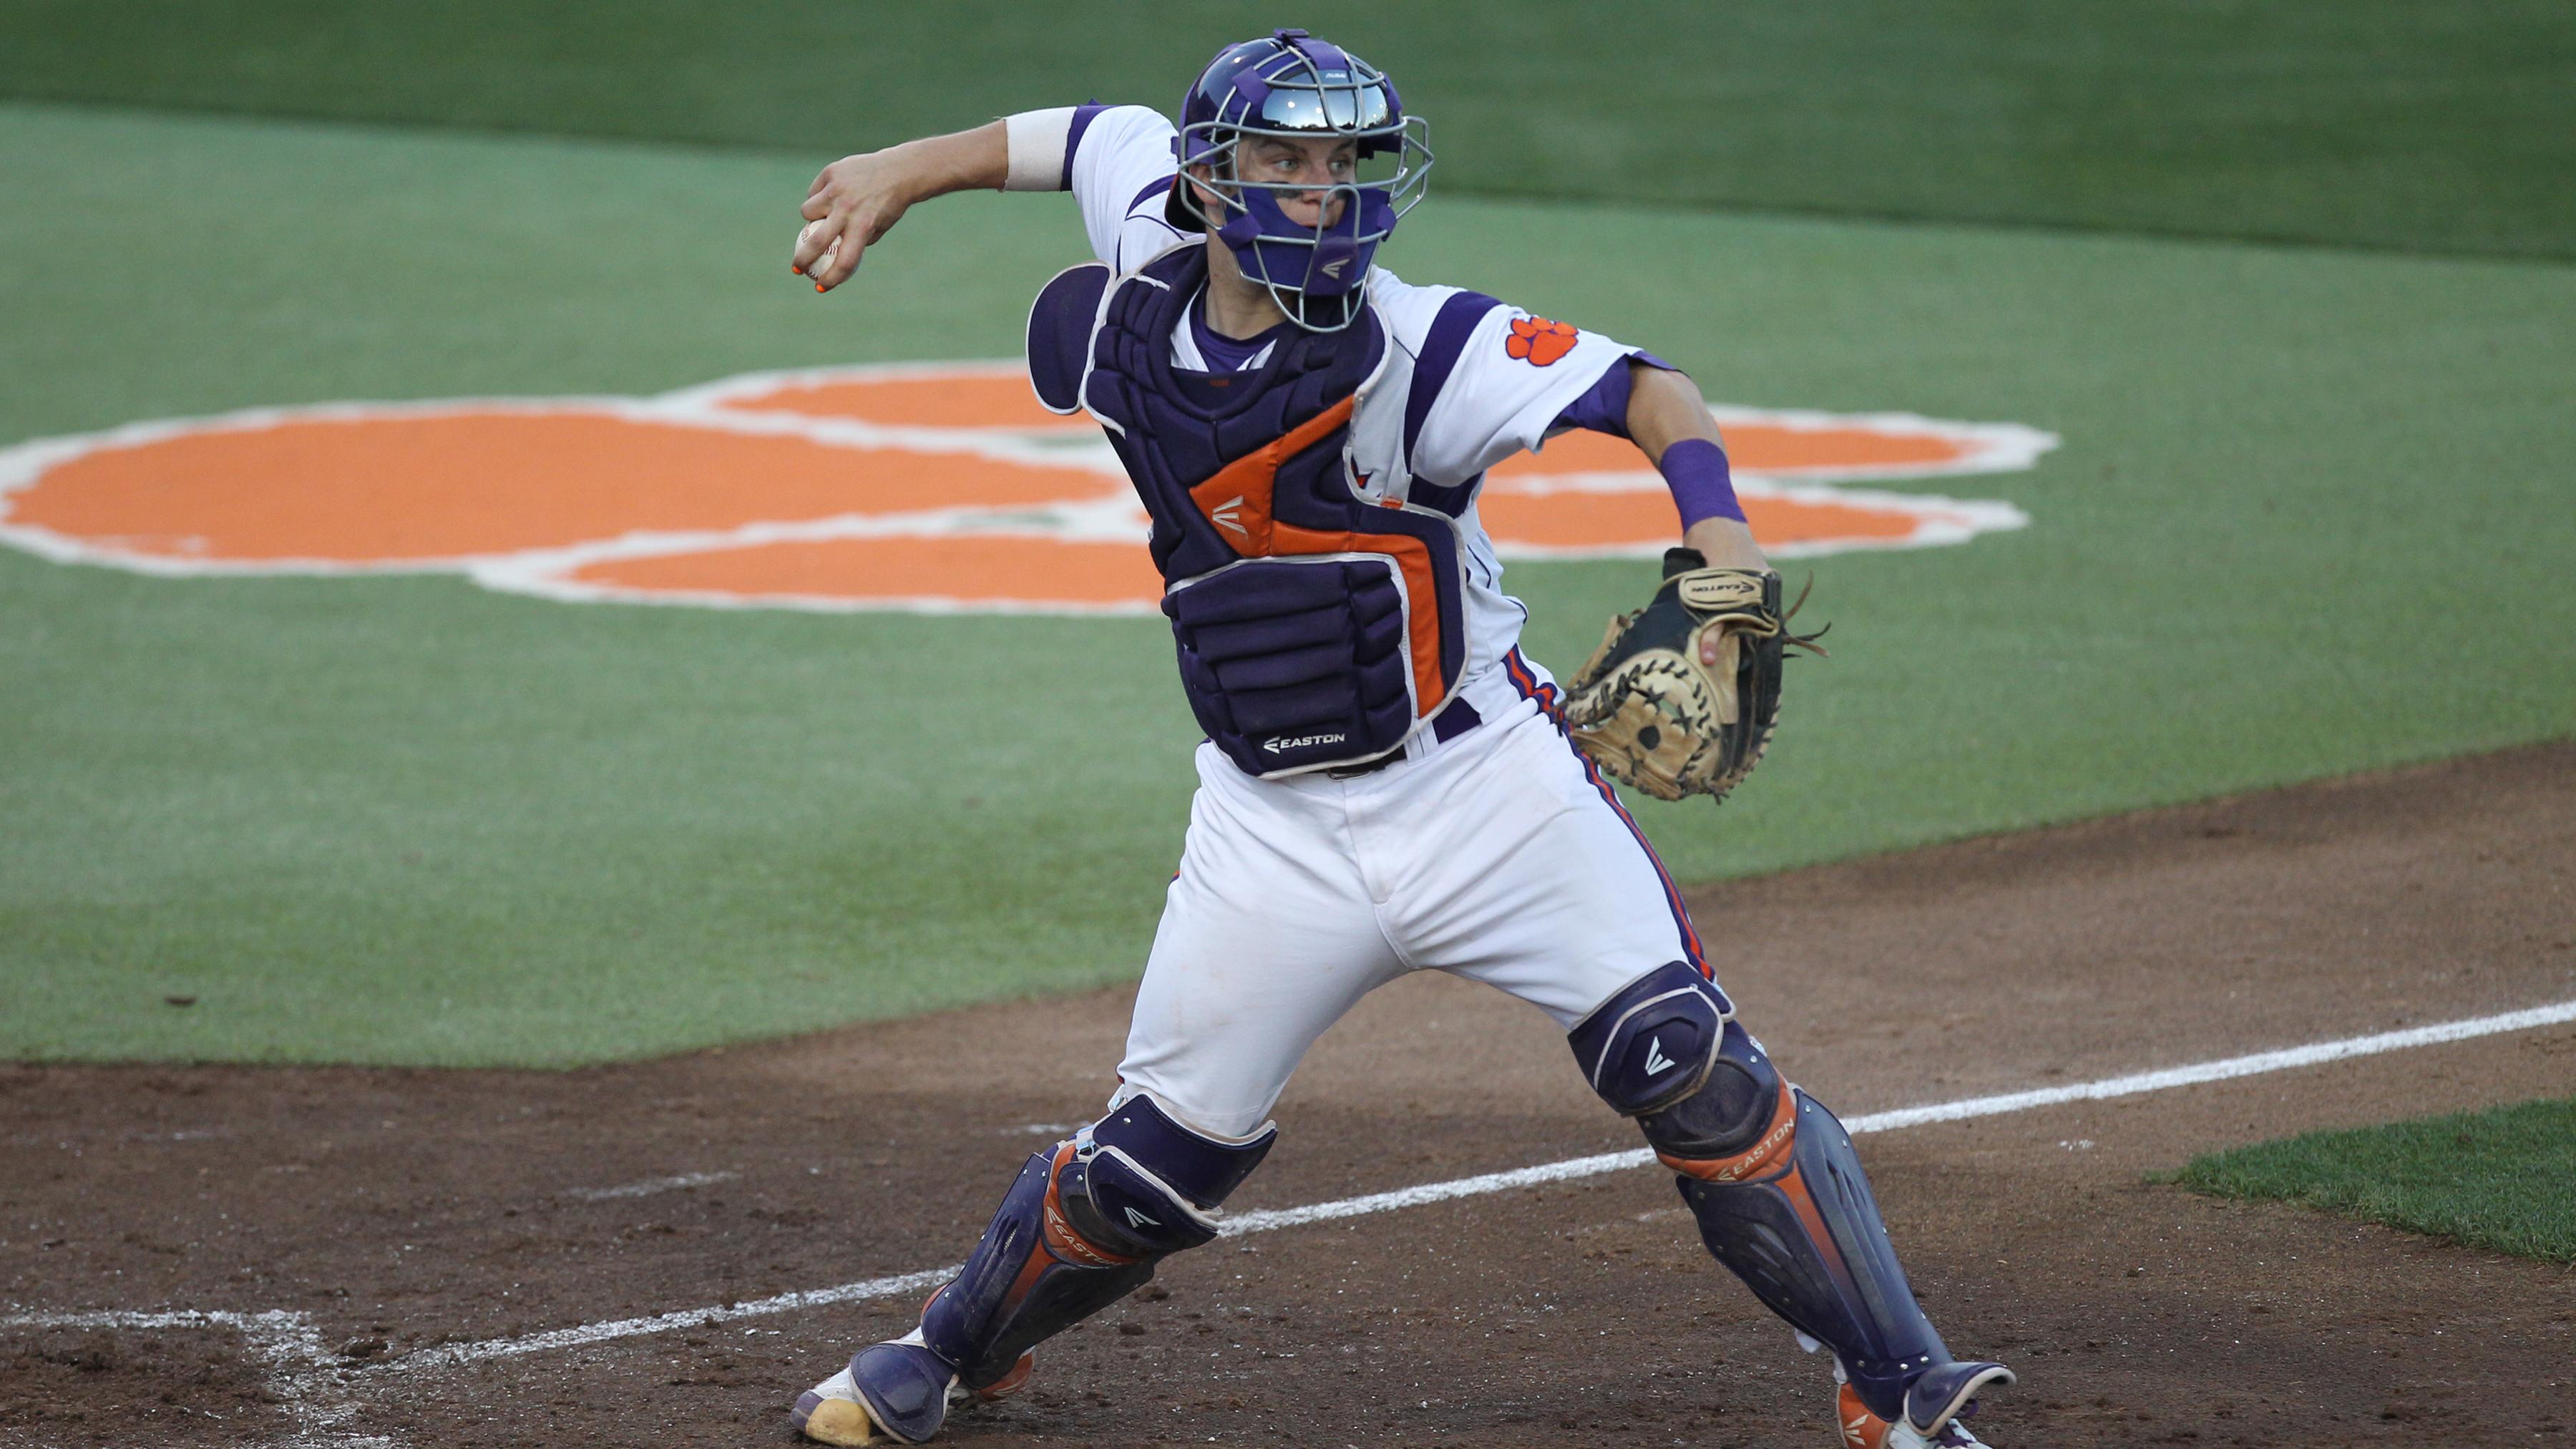 Okey Named to USA Baseball Collegiate National Team